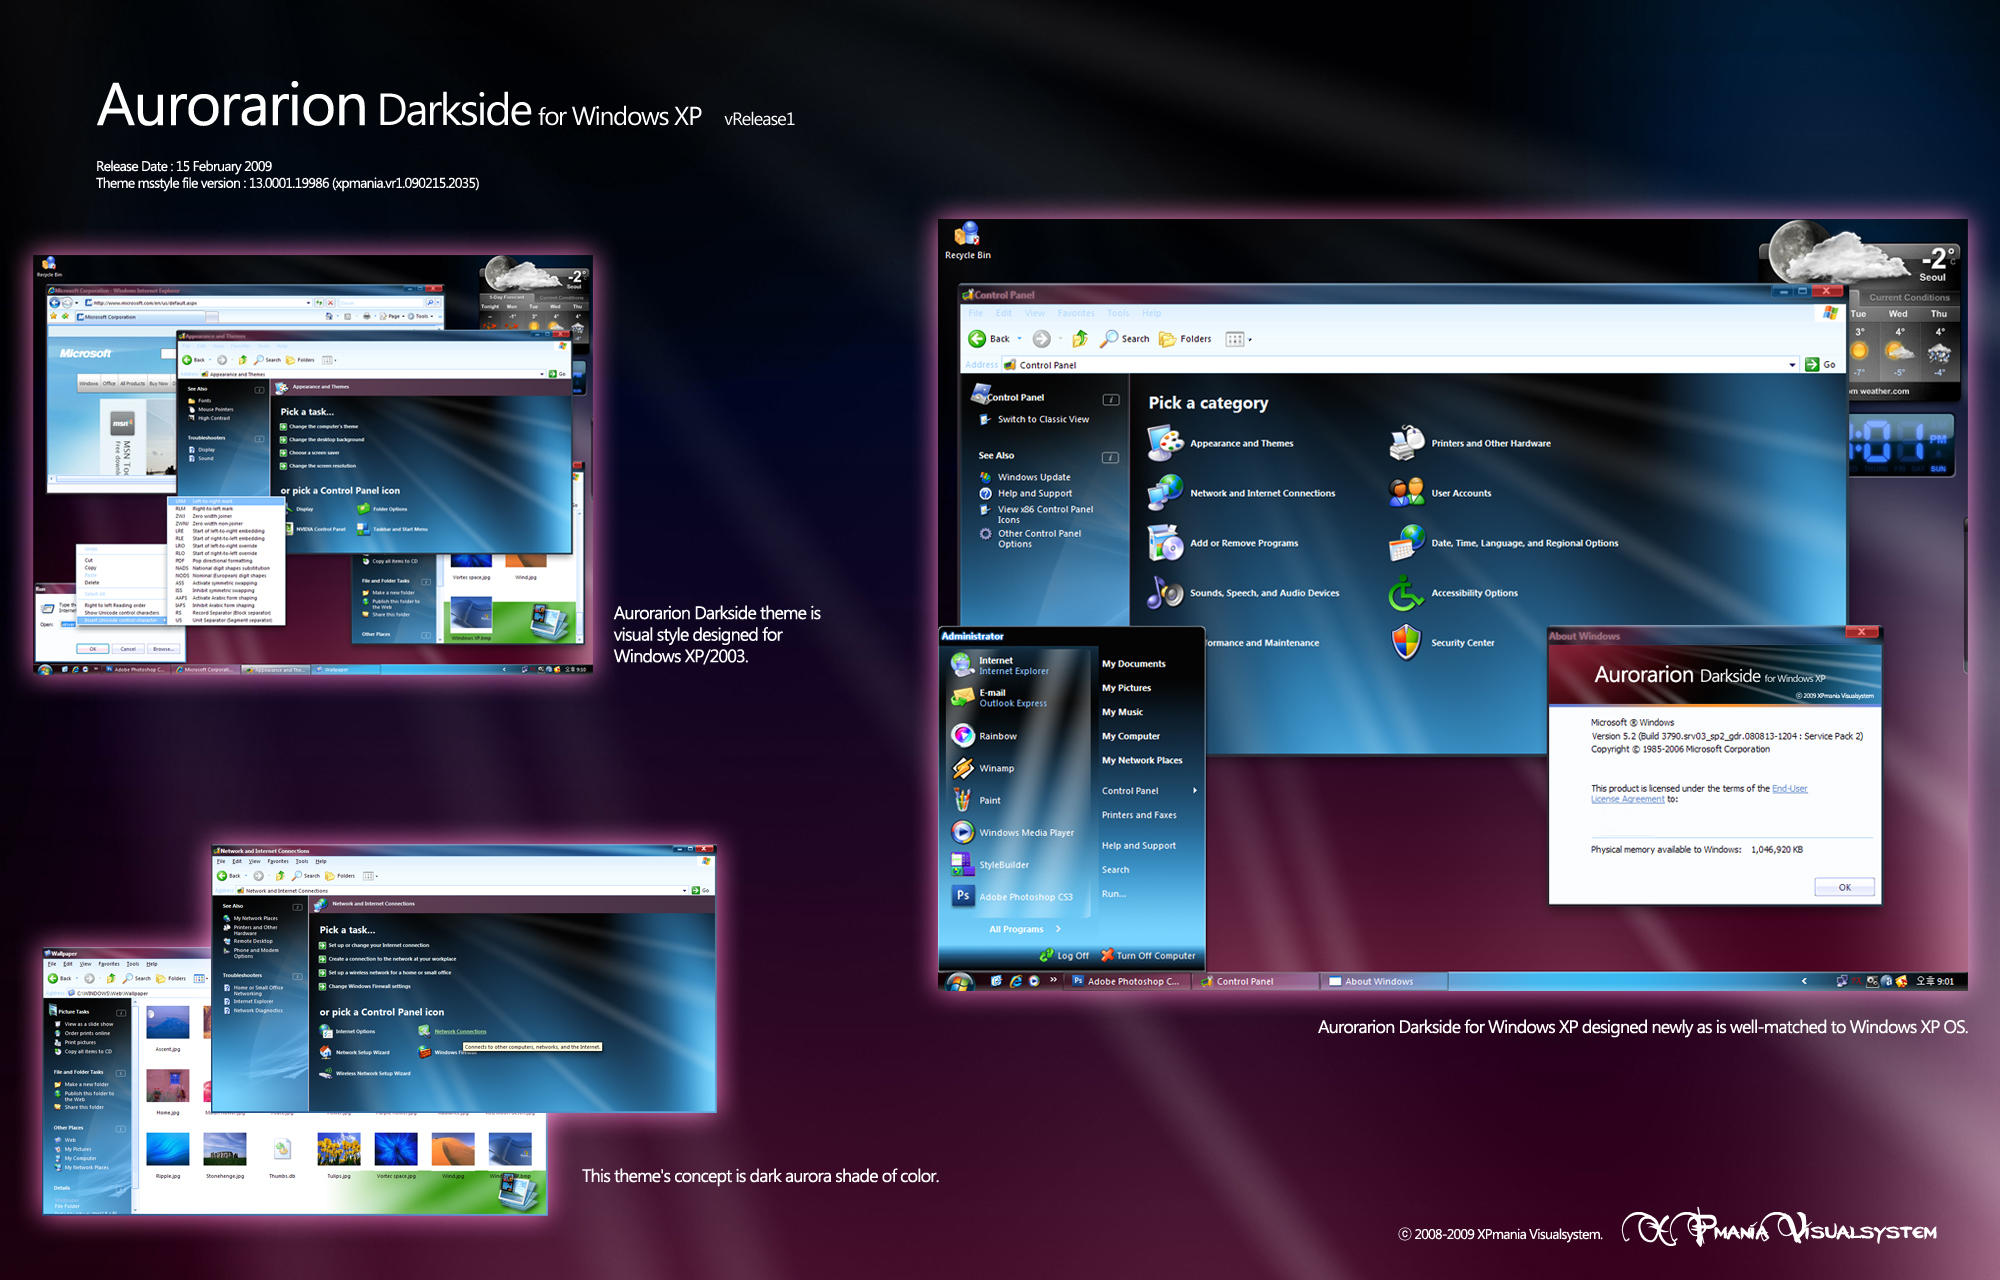 "Aurorarion Darkside XP vR1.11 "" Đổi Giao Diện WIn Xp"" Aurorarion_Darkside_XP_vR1_11_by_XPmania"